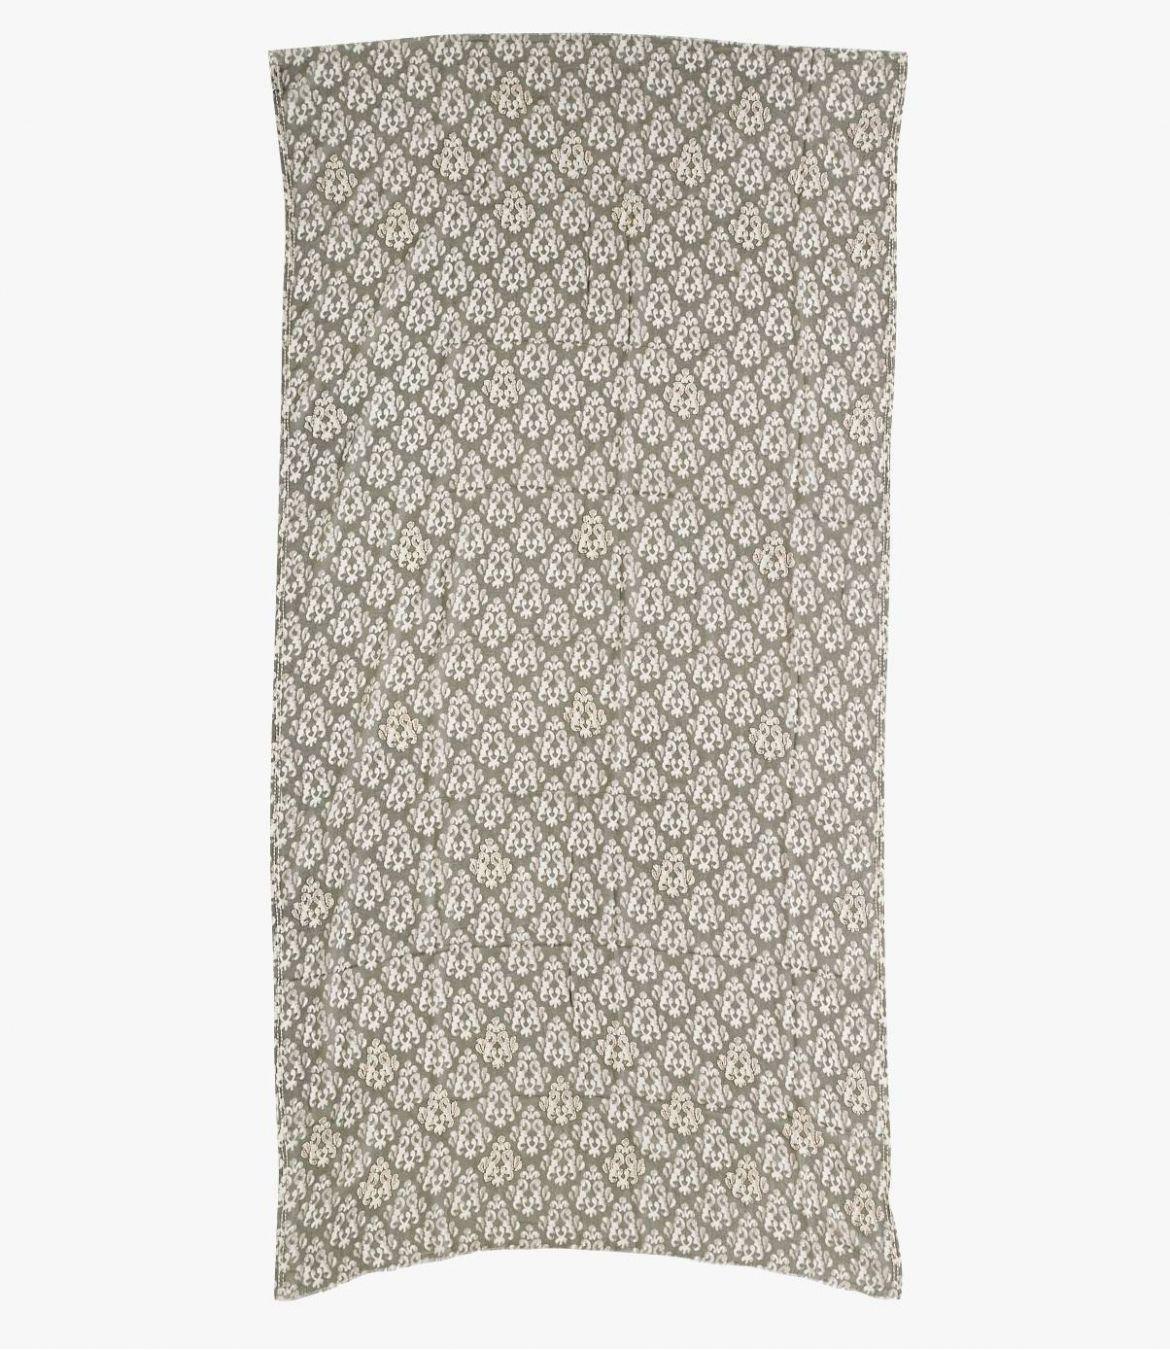 CHARMANTE Modal scarf, Women's wool 100 x 200 CM Storiatipic - 2